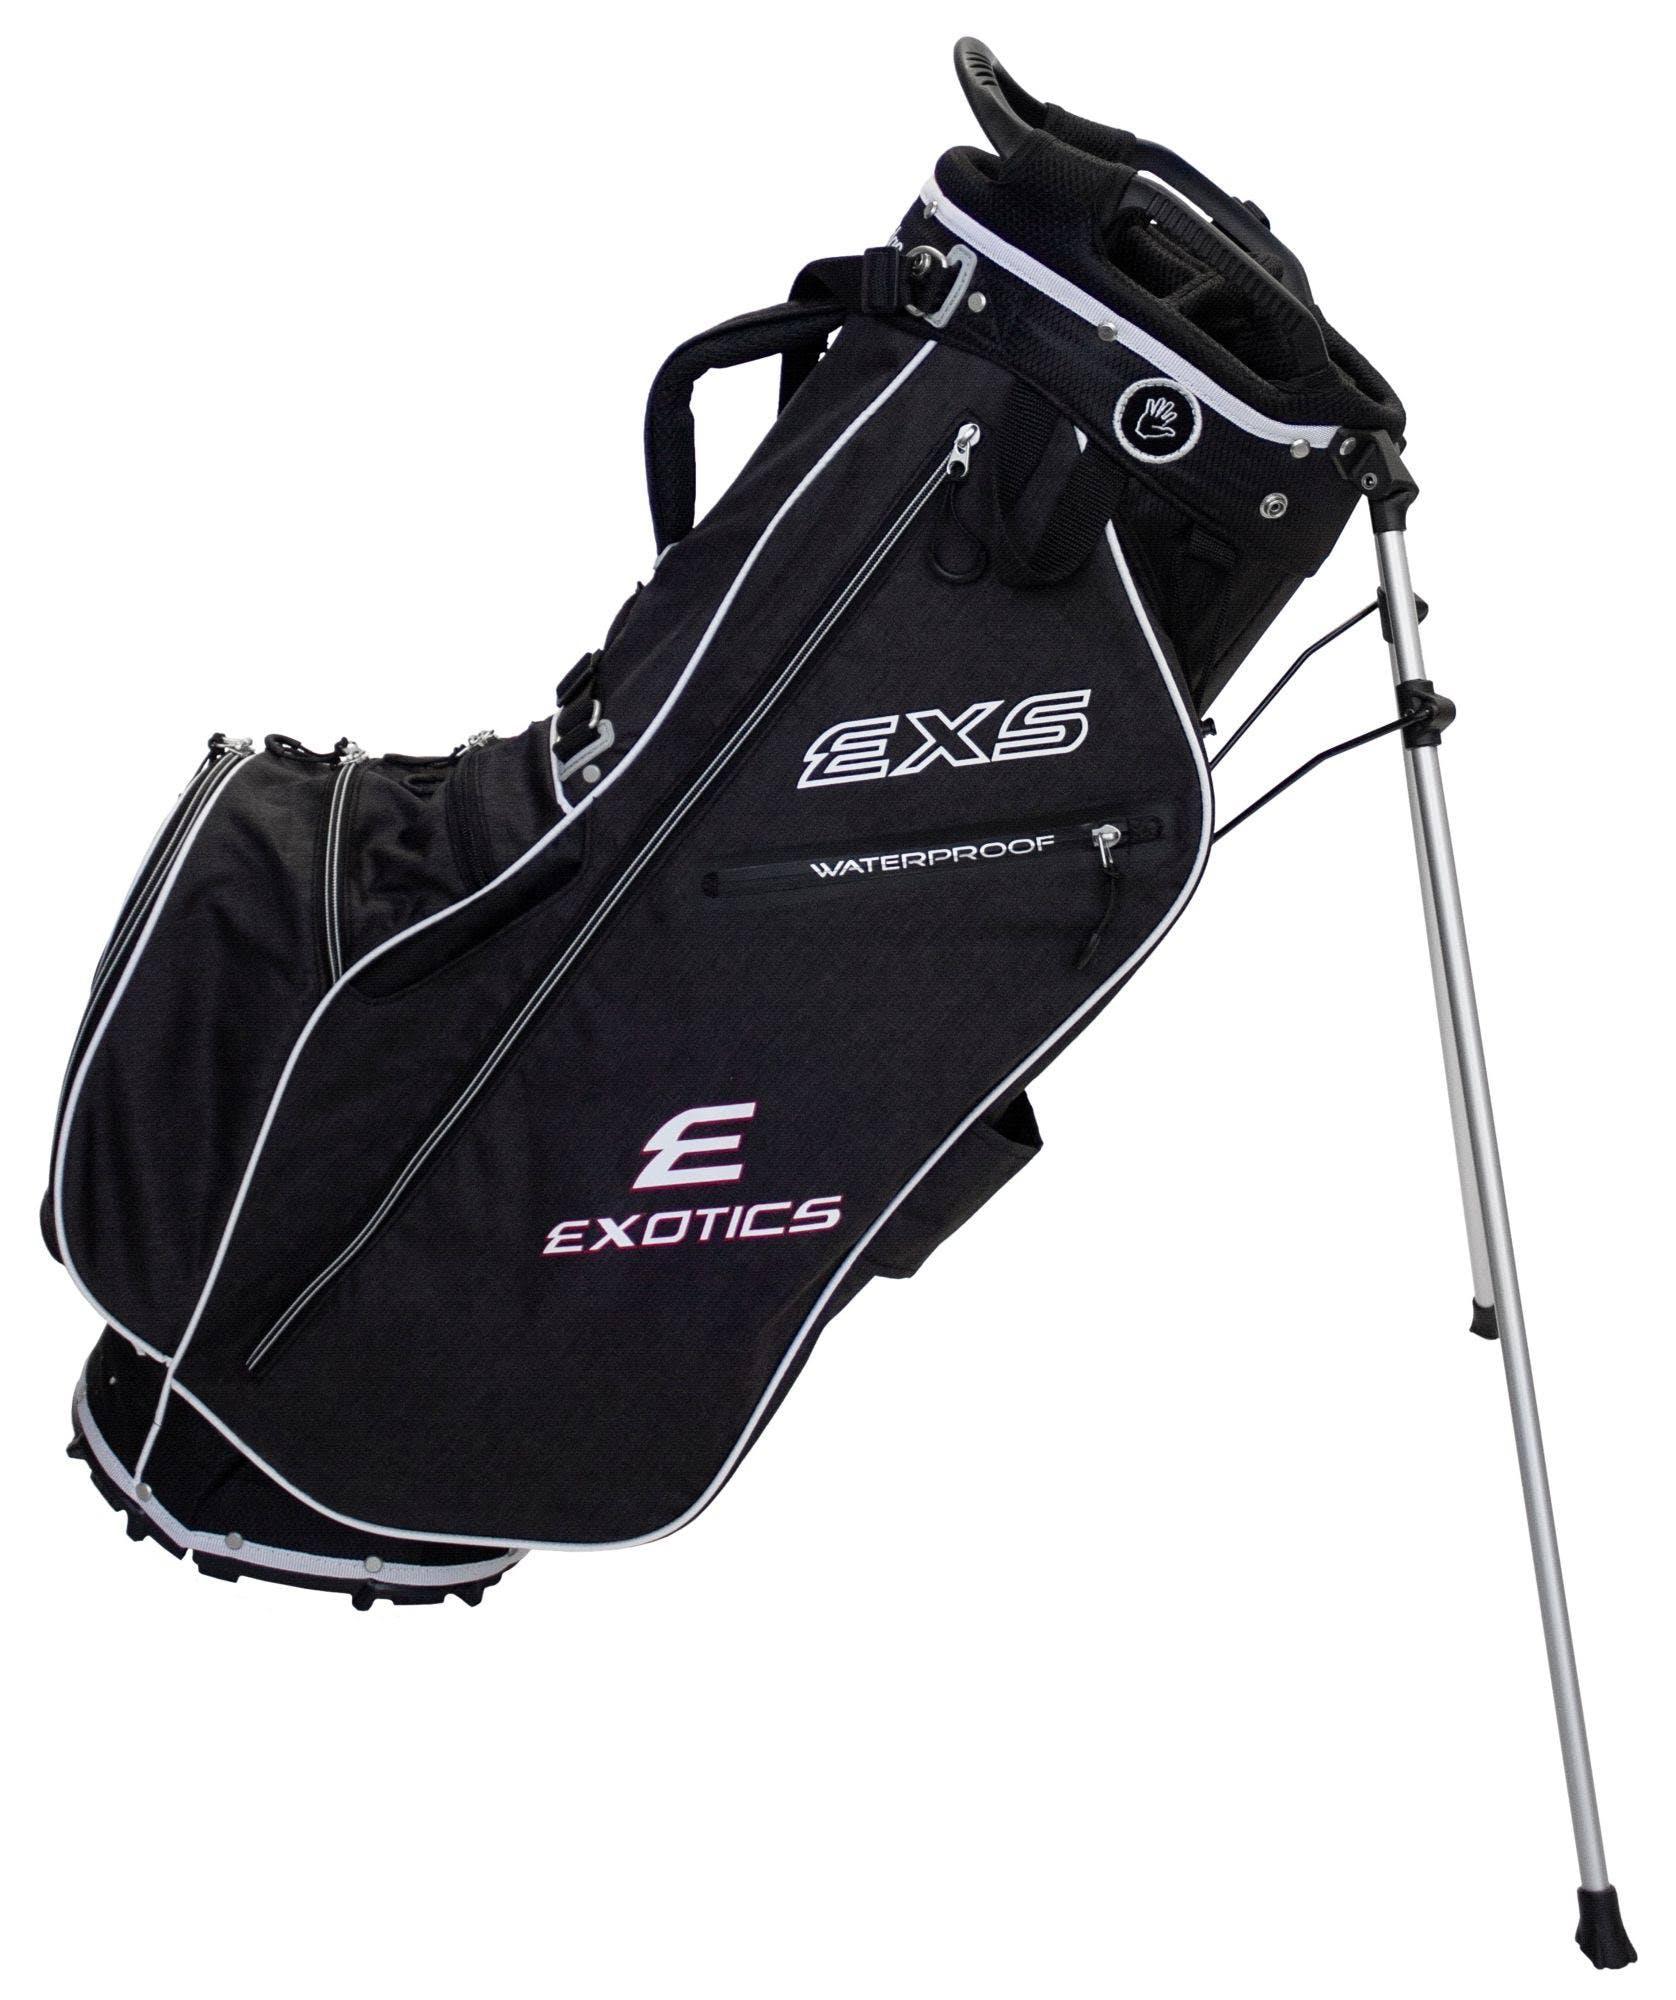 Tour Edge Exotics EXS Xtreme Stand Golf Bag, Black